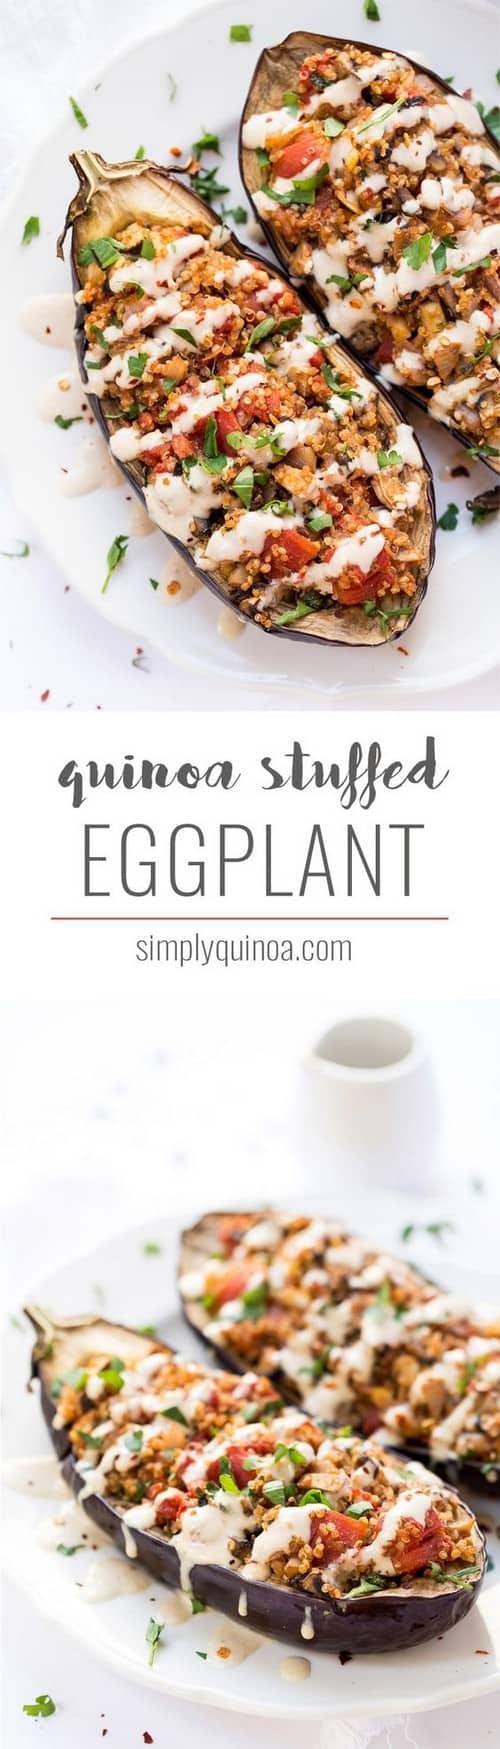 Mediterranean Quinoa Stuffed Eggplant with Tahini Sauce